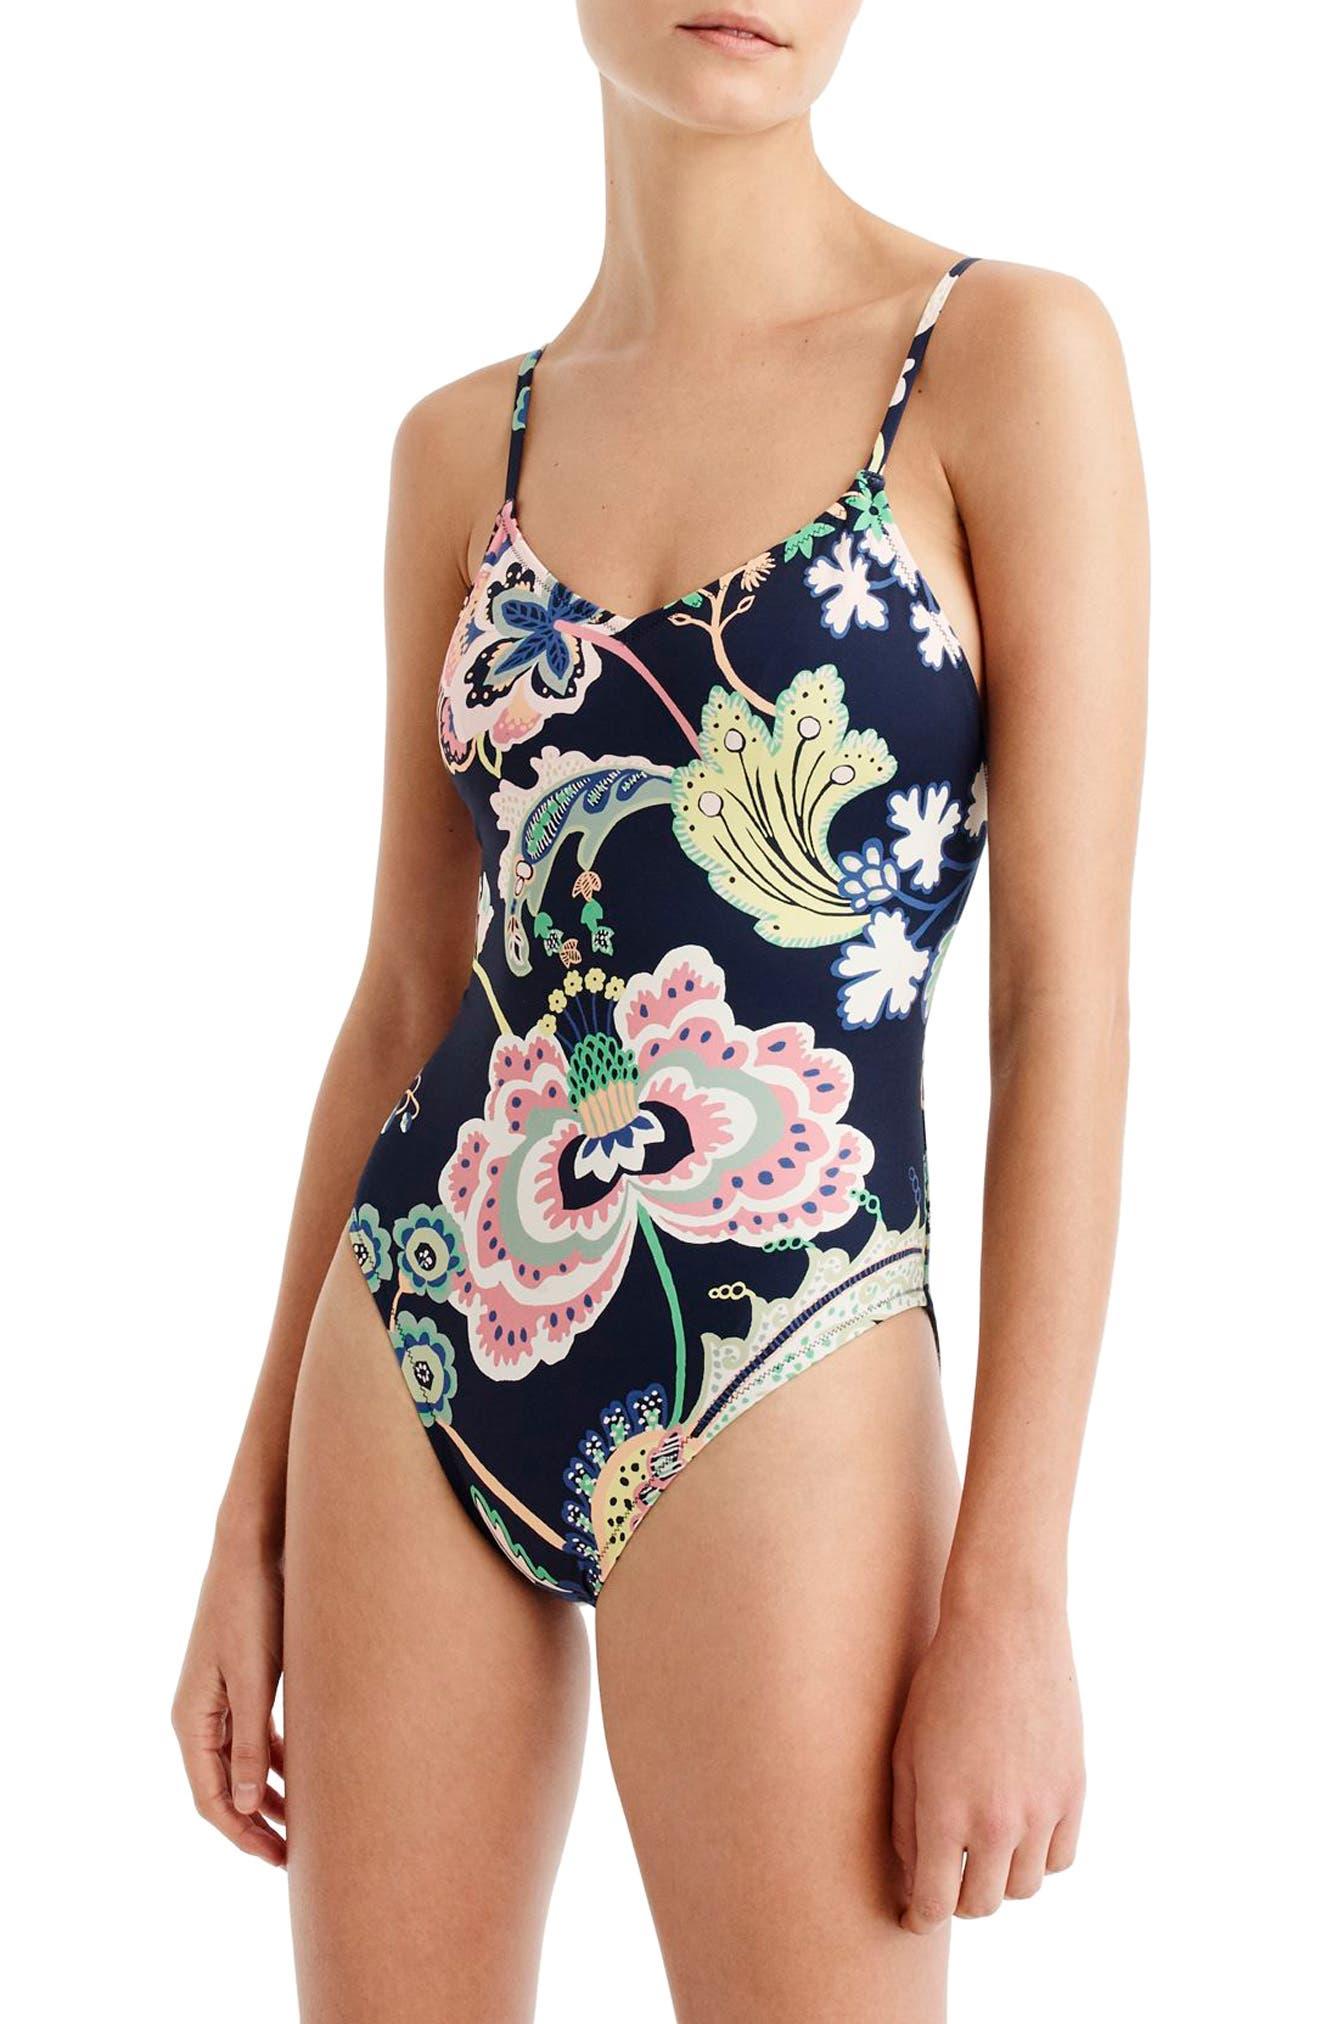 Ballet One-Piece Swimsuit,                             Main thumbnail 1, color,                             Navy Multi